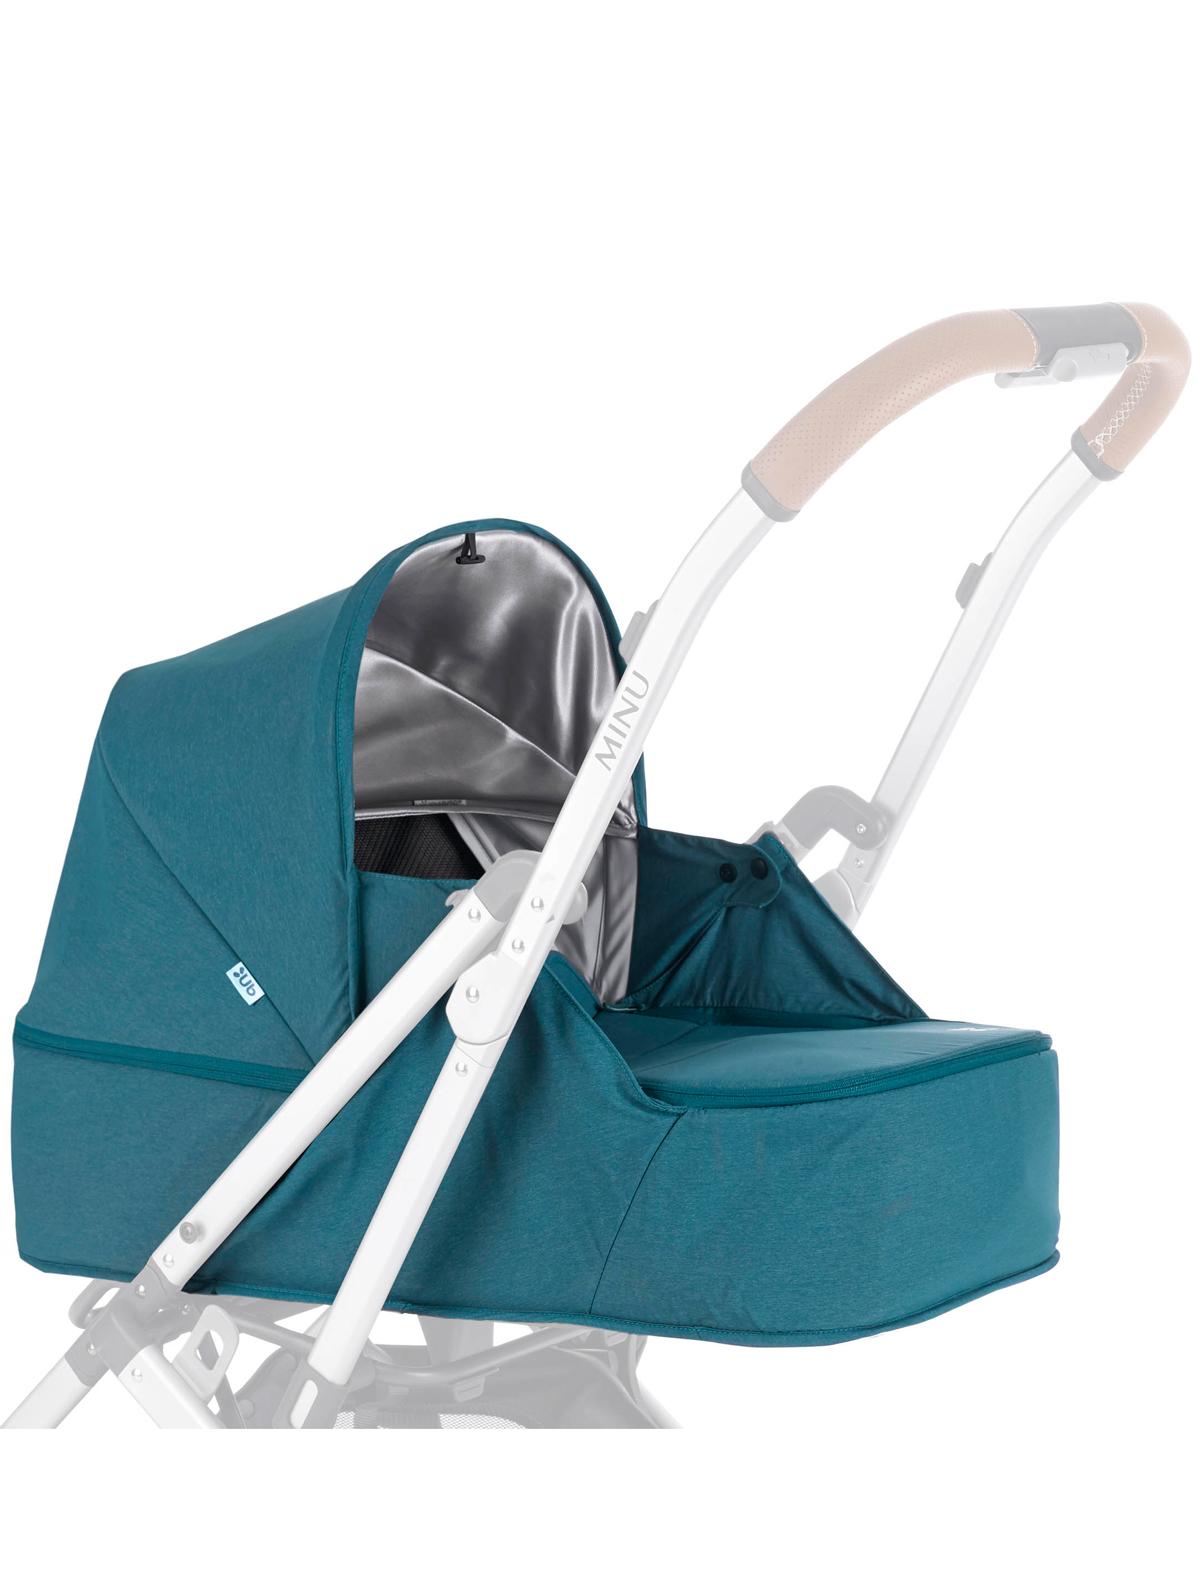 Аксессуар для коляски UPPAbaby 2152444 голубого цвета